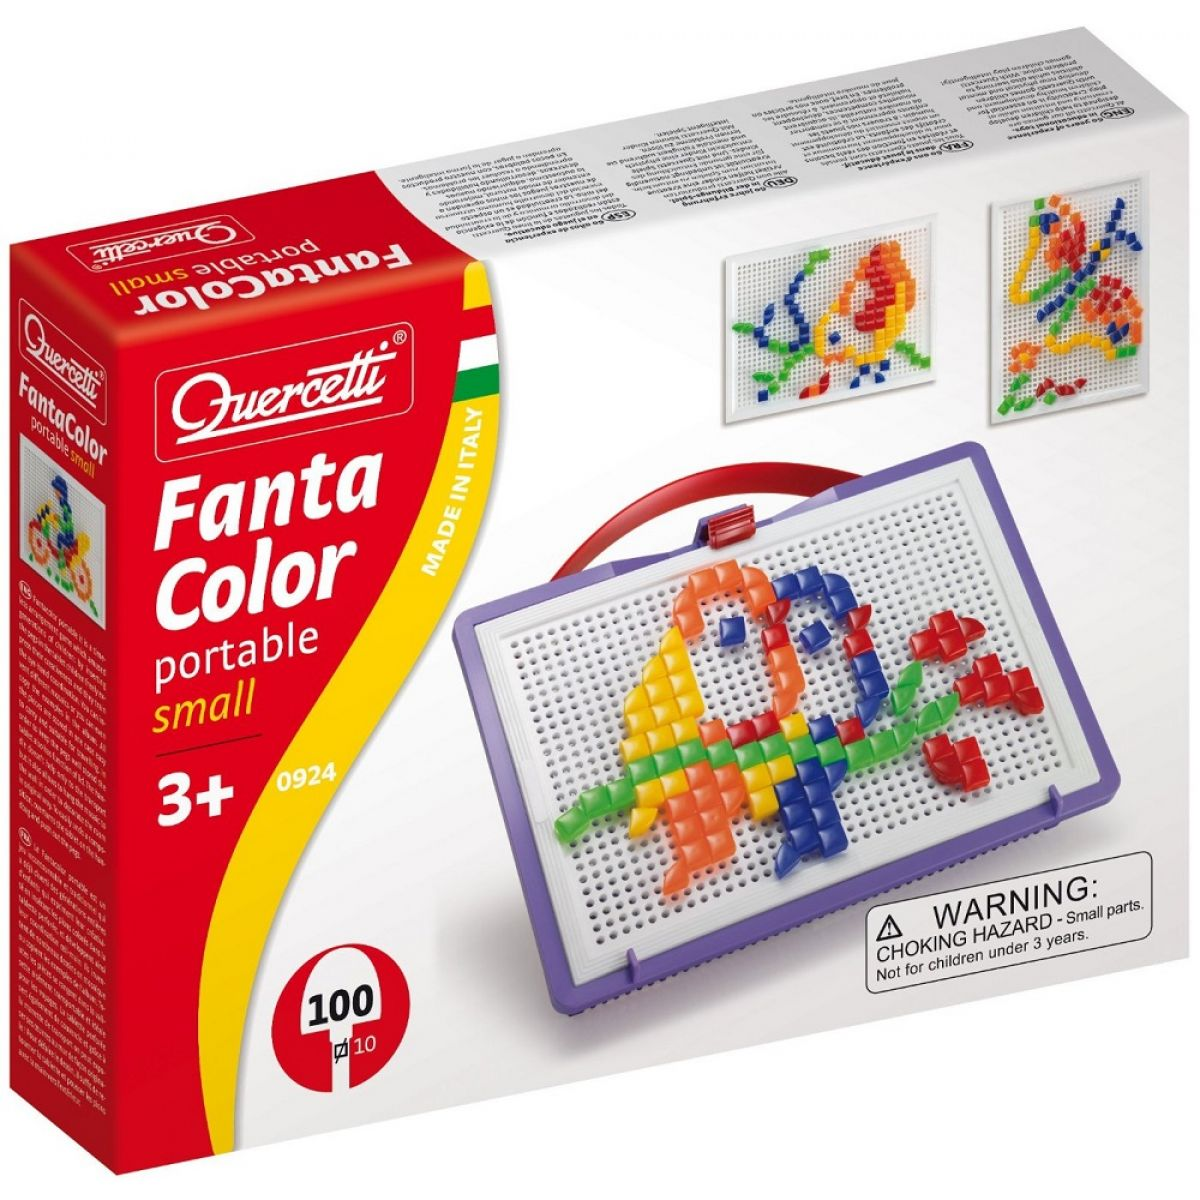 Quercetti Mozaika Fantacolor Portable Čtverečky 100ks